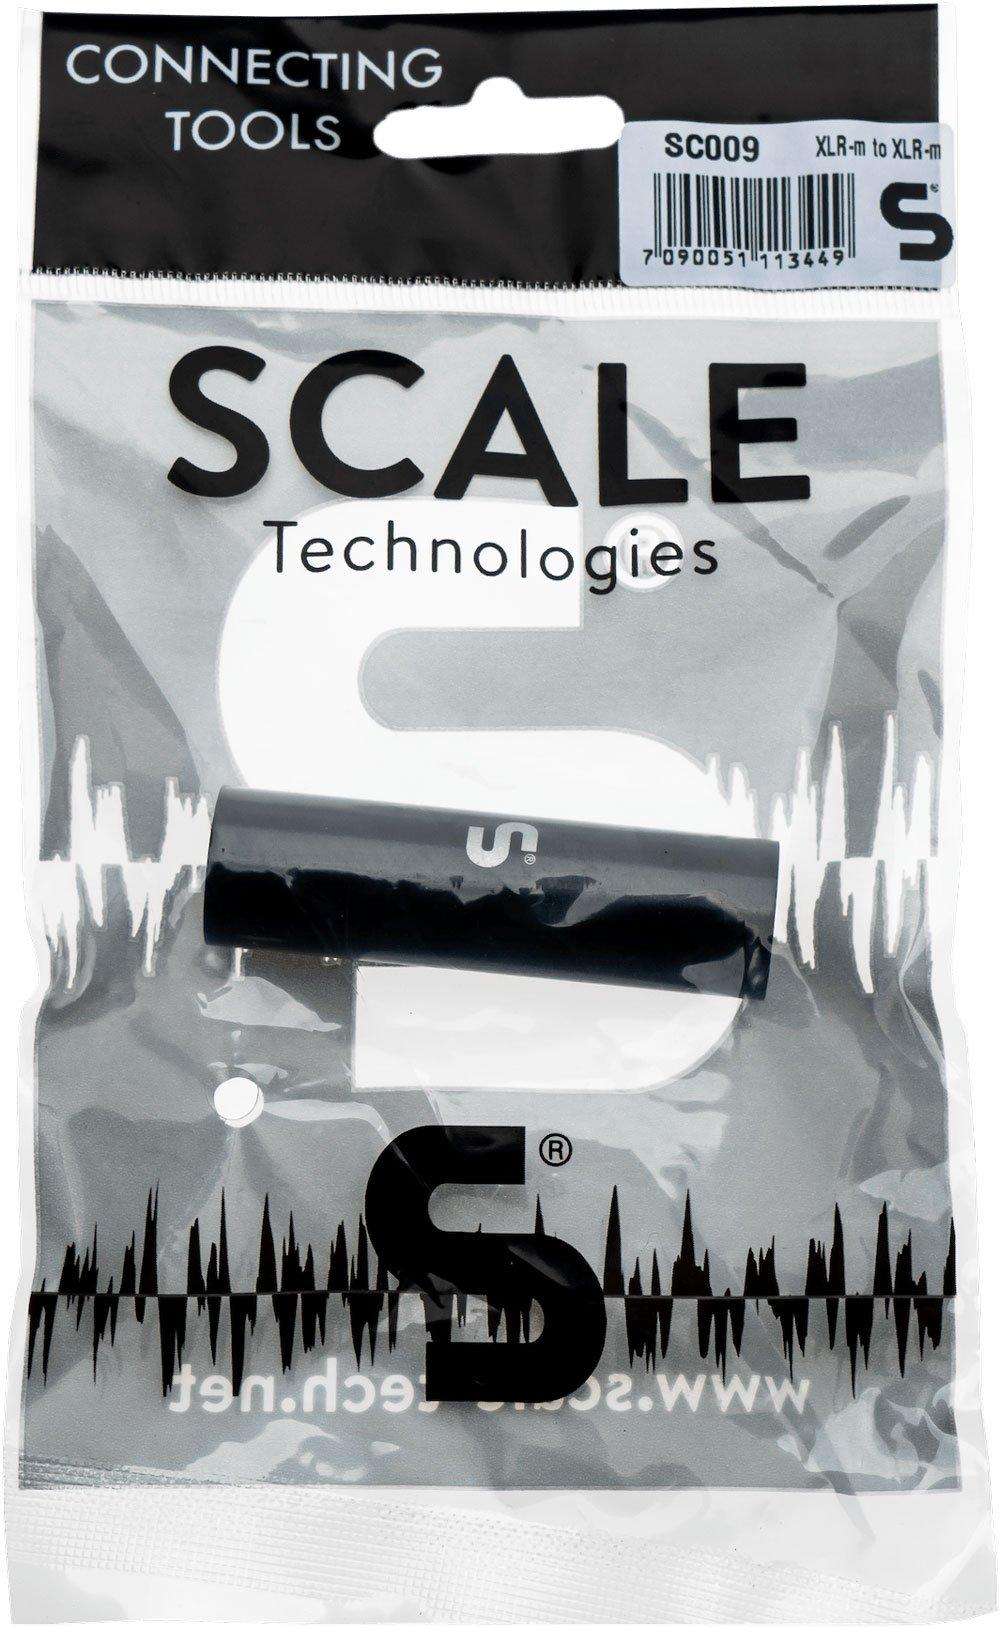 Scale Technologies SC009 - XLR Male to XLR Male Adapte